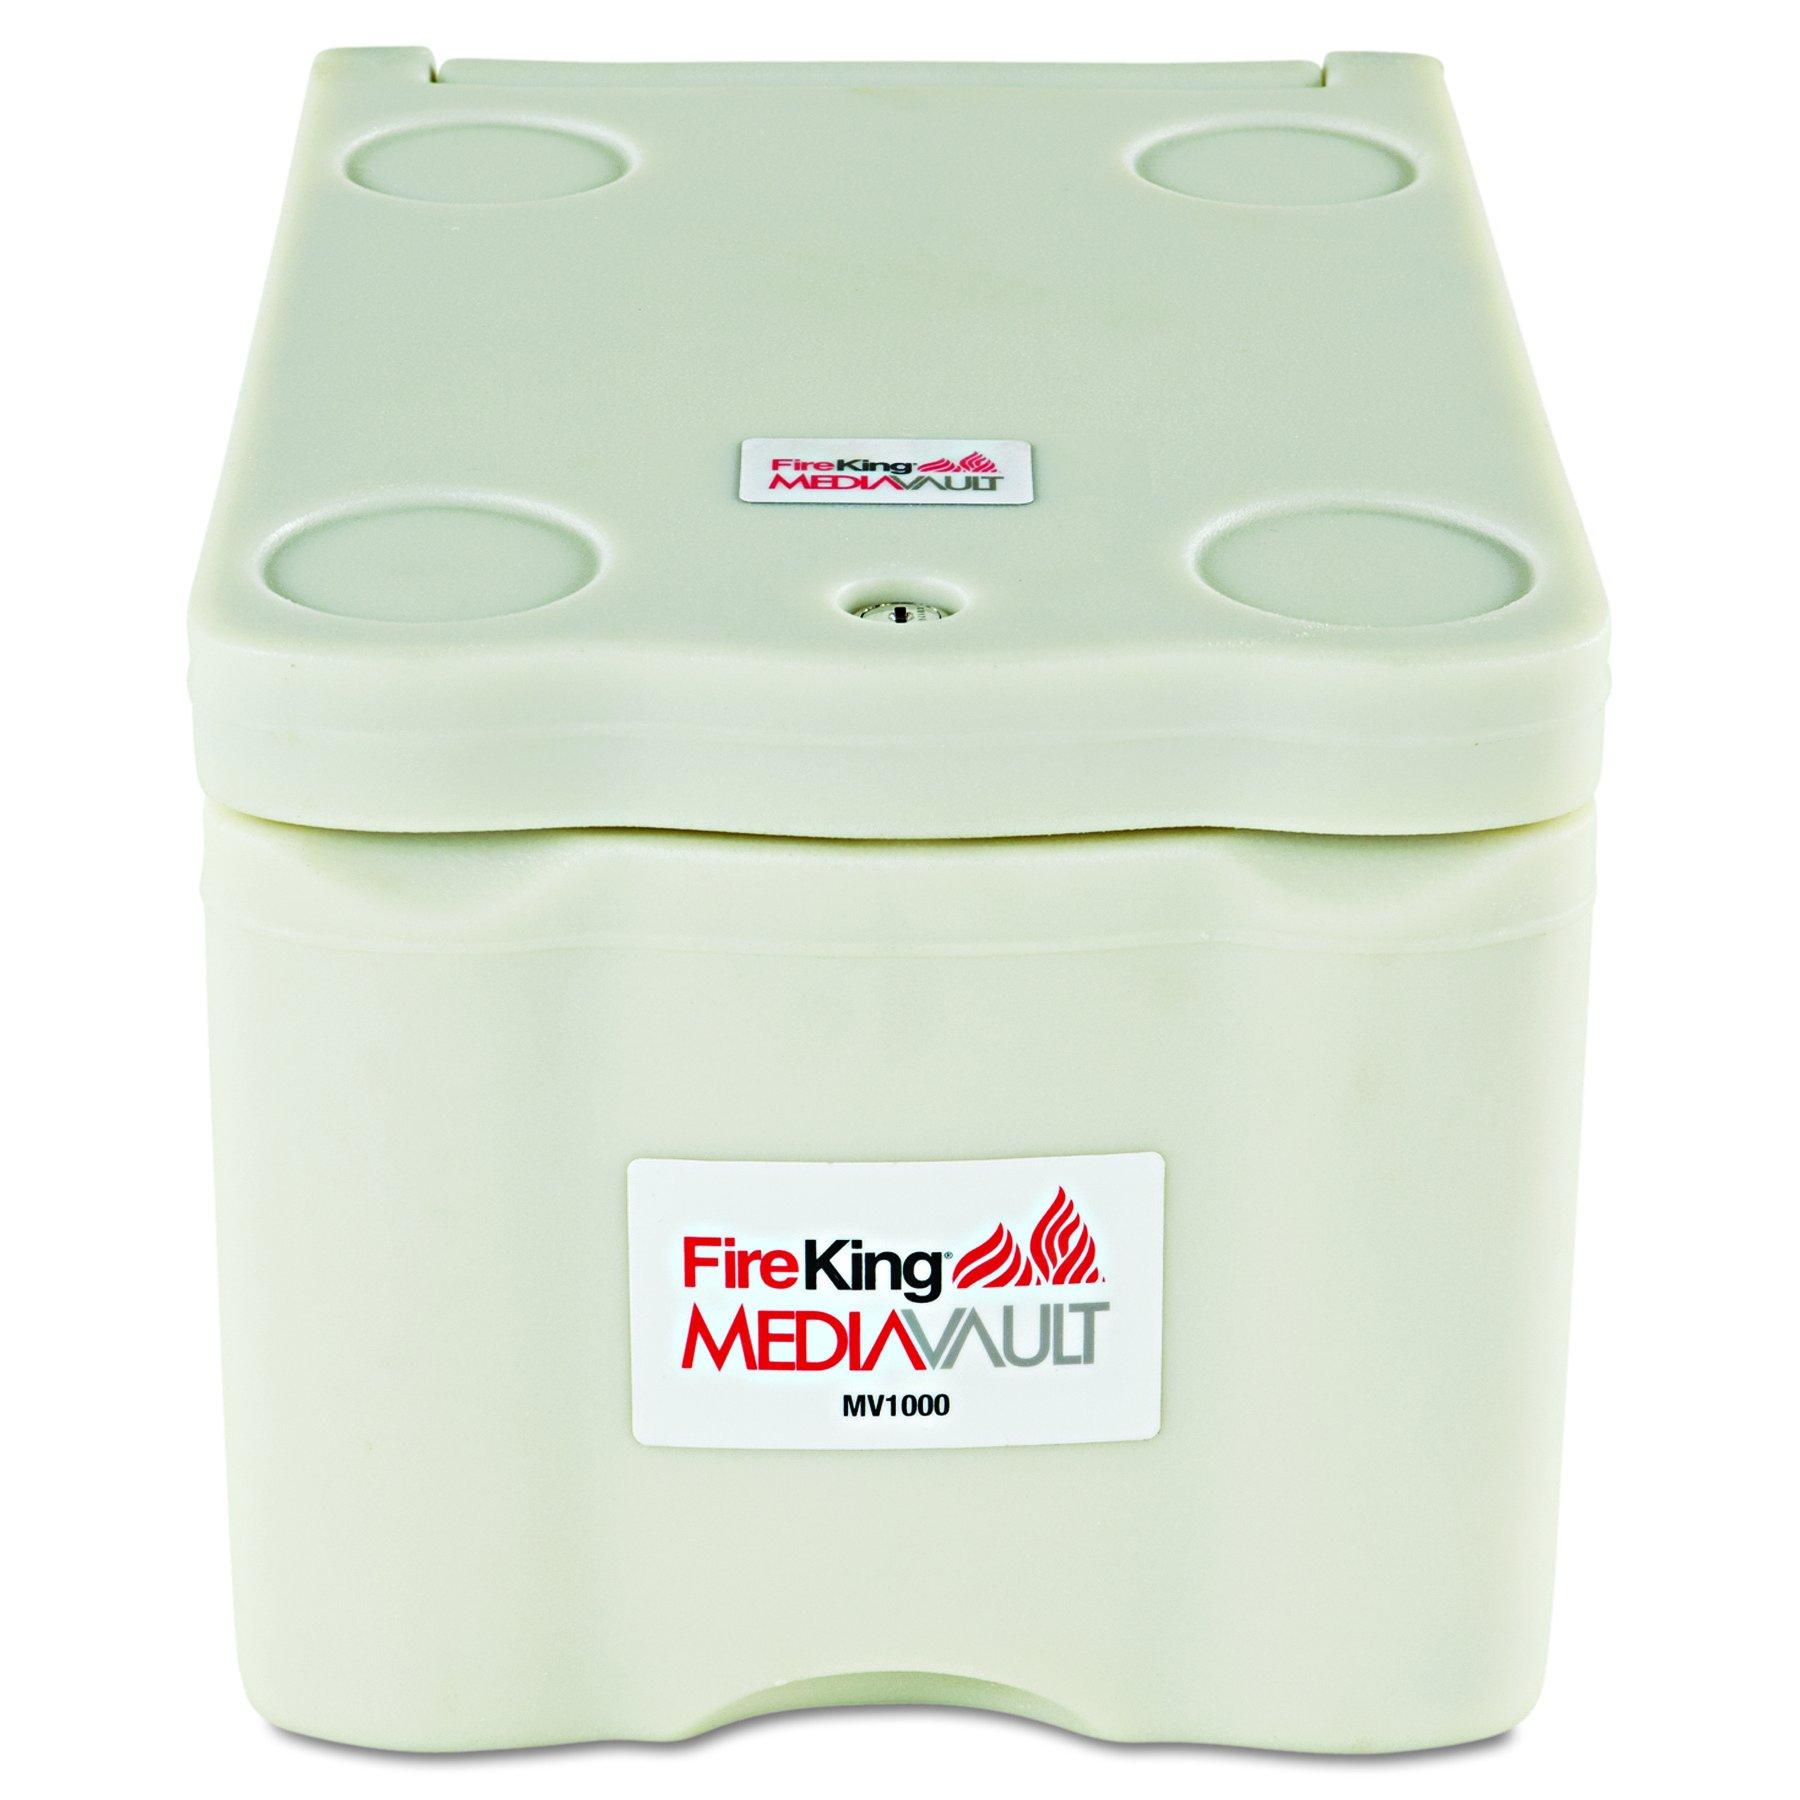 FireKing Stand Alone Media Vault Safe, 11-5/8'' x 10-1/2'' x 17-1/2'', White (FIRMV1000)